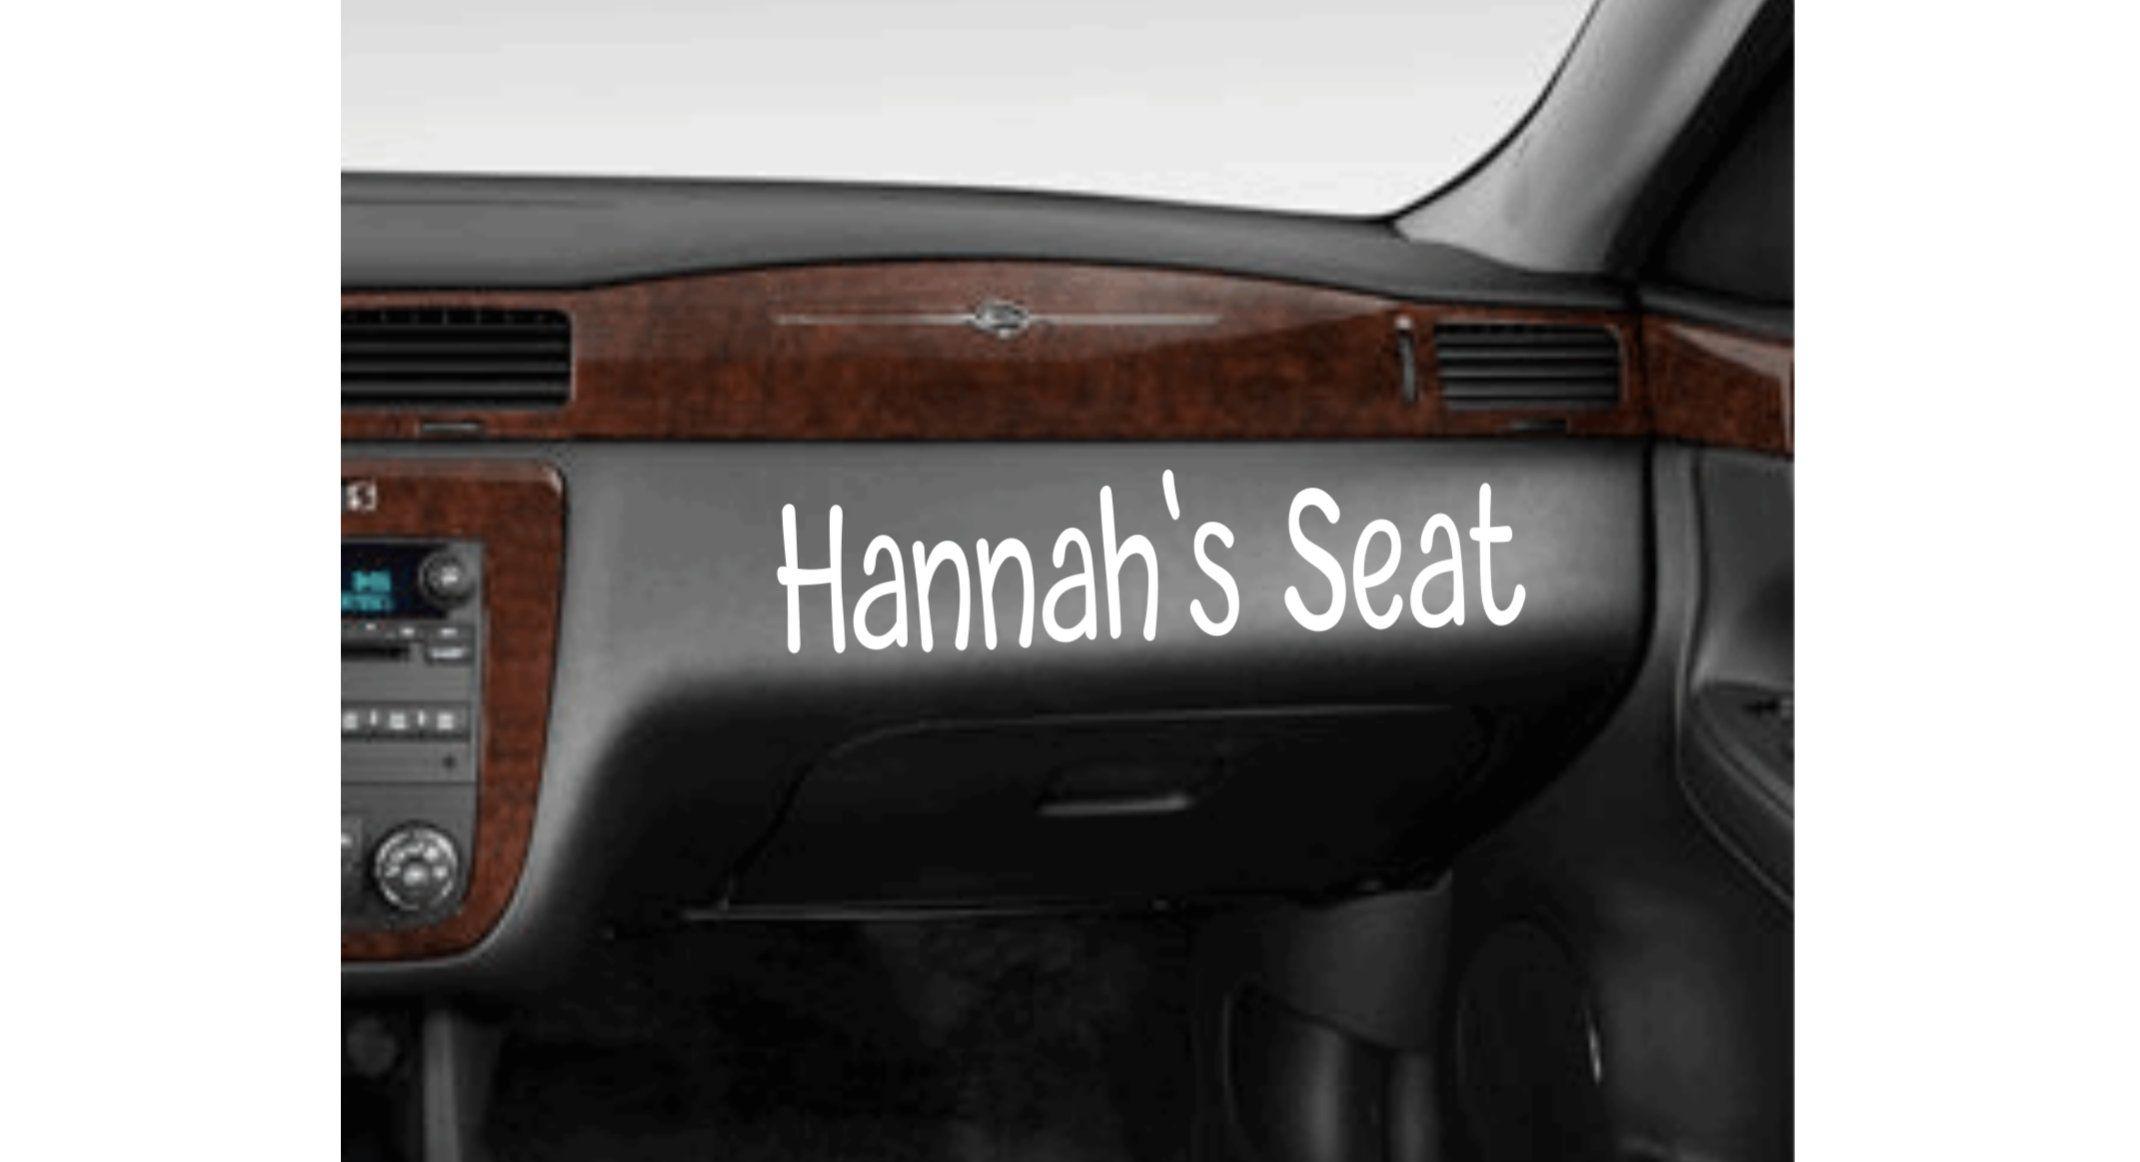 New Girlfriend Seat Sticker For Car Car Sticker Name Decal For Car Relationship Sticker Custom Name Vinyl Decal Her Seat Gift For Her Car Stickers Car Decals Vinyl Decals [ 1162 x 2140 Pixel ]